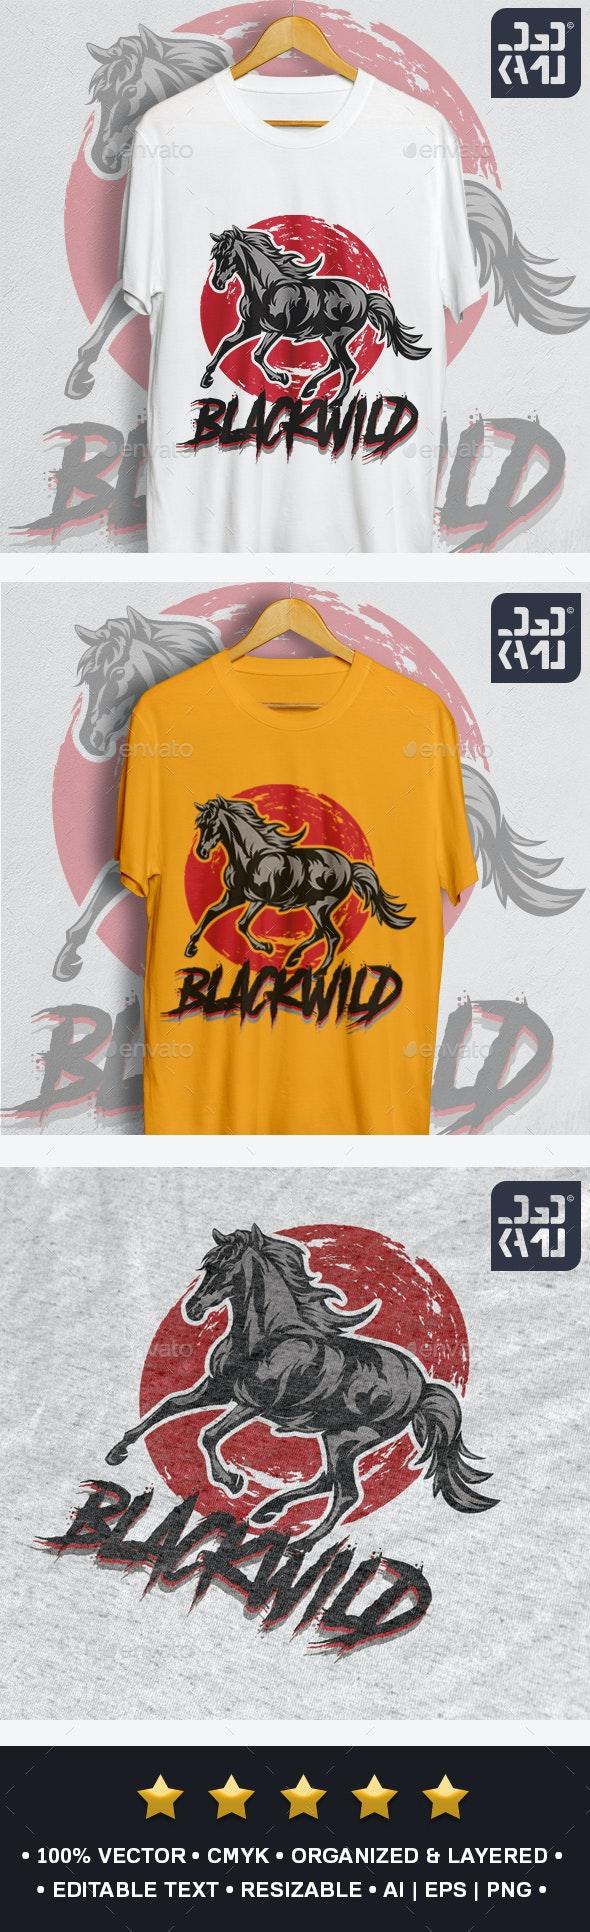 Black Wild T-Shirt - Designs T-Shirts